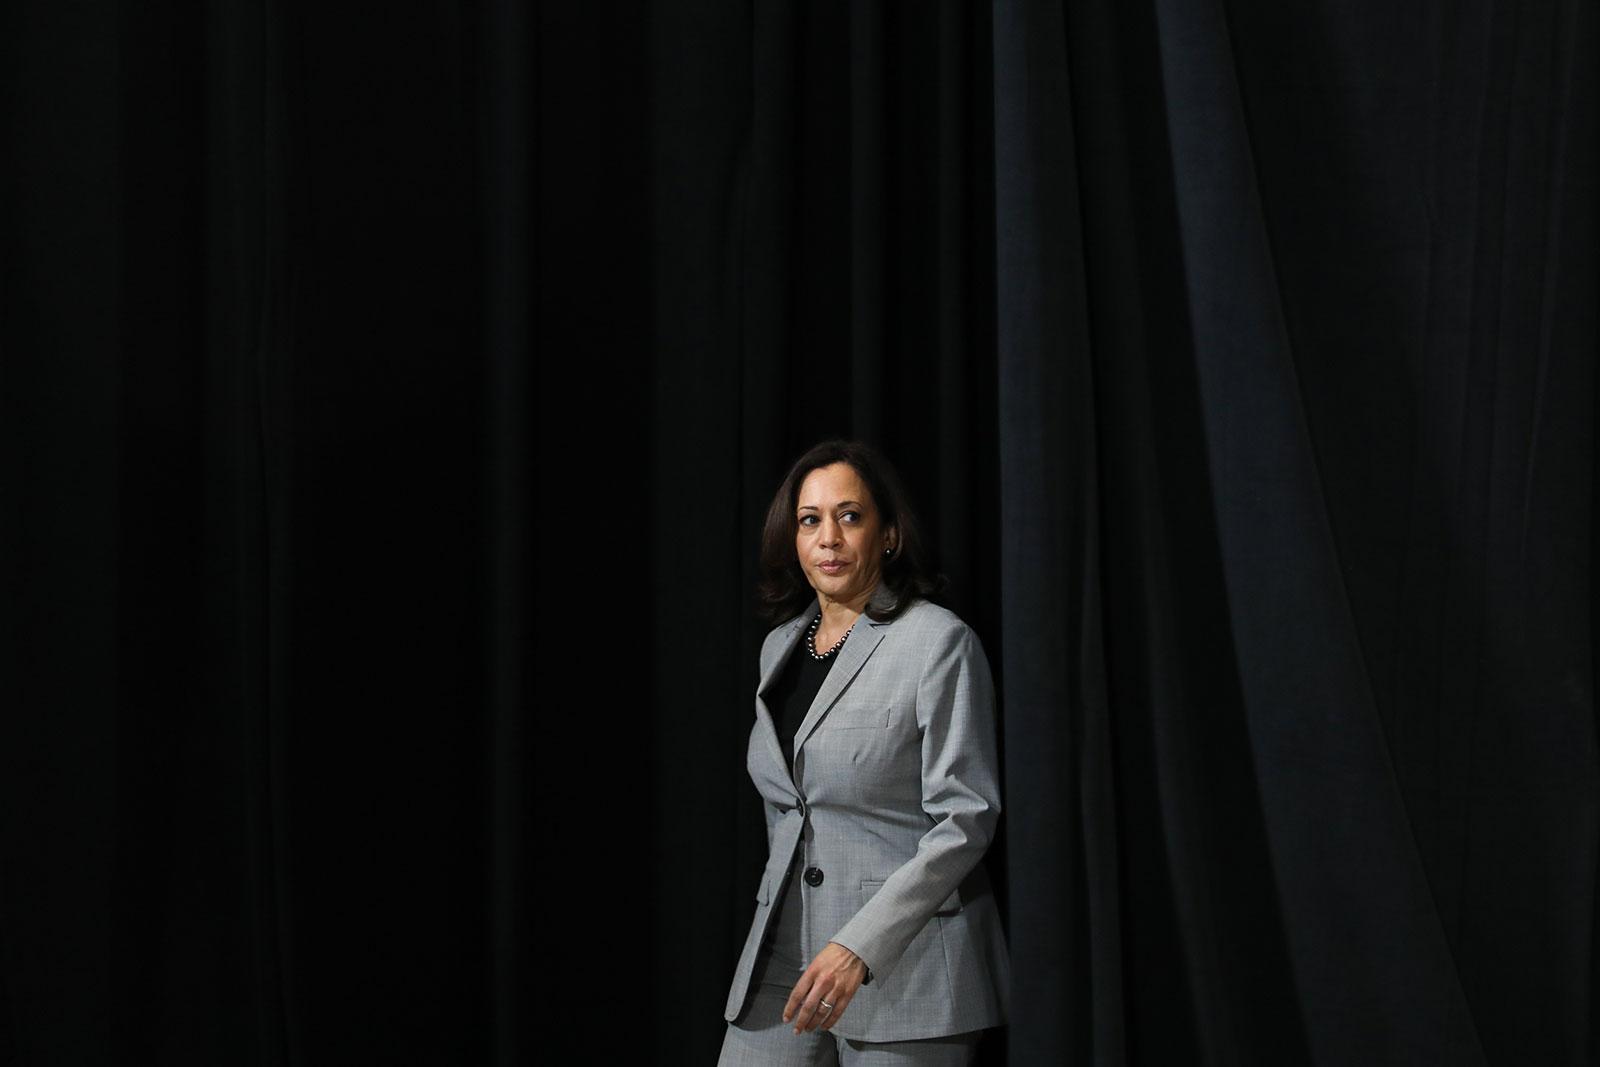 Democratic vice presidential nominee Kamala Harris arrives at Shaw University in Raleigh, North Carolina, on Monday.